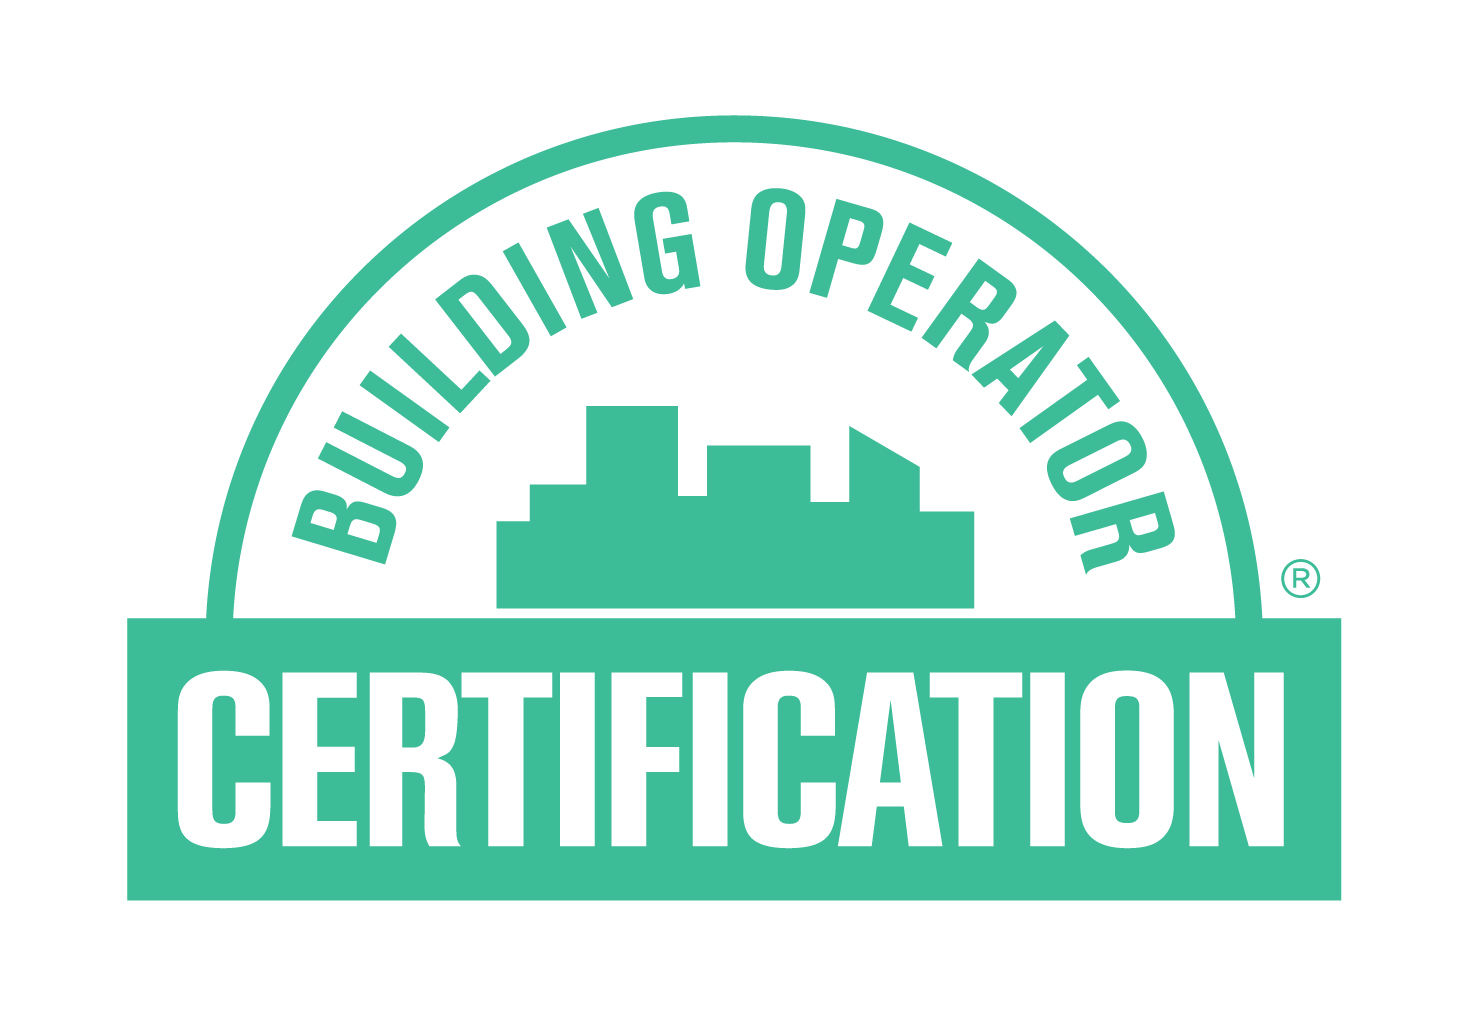 Ciet building operator certification boclogoteal the building operator certification xflitez Images